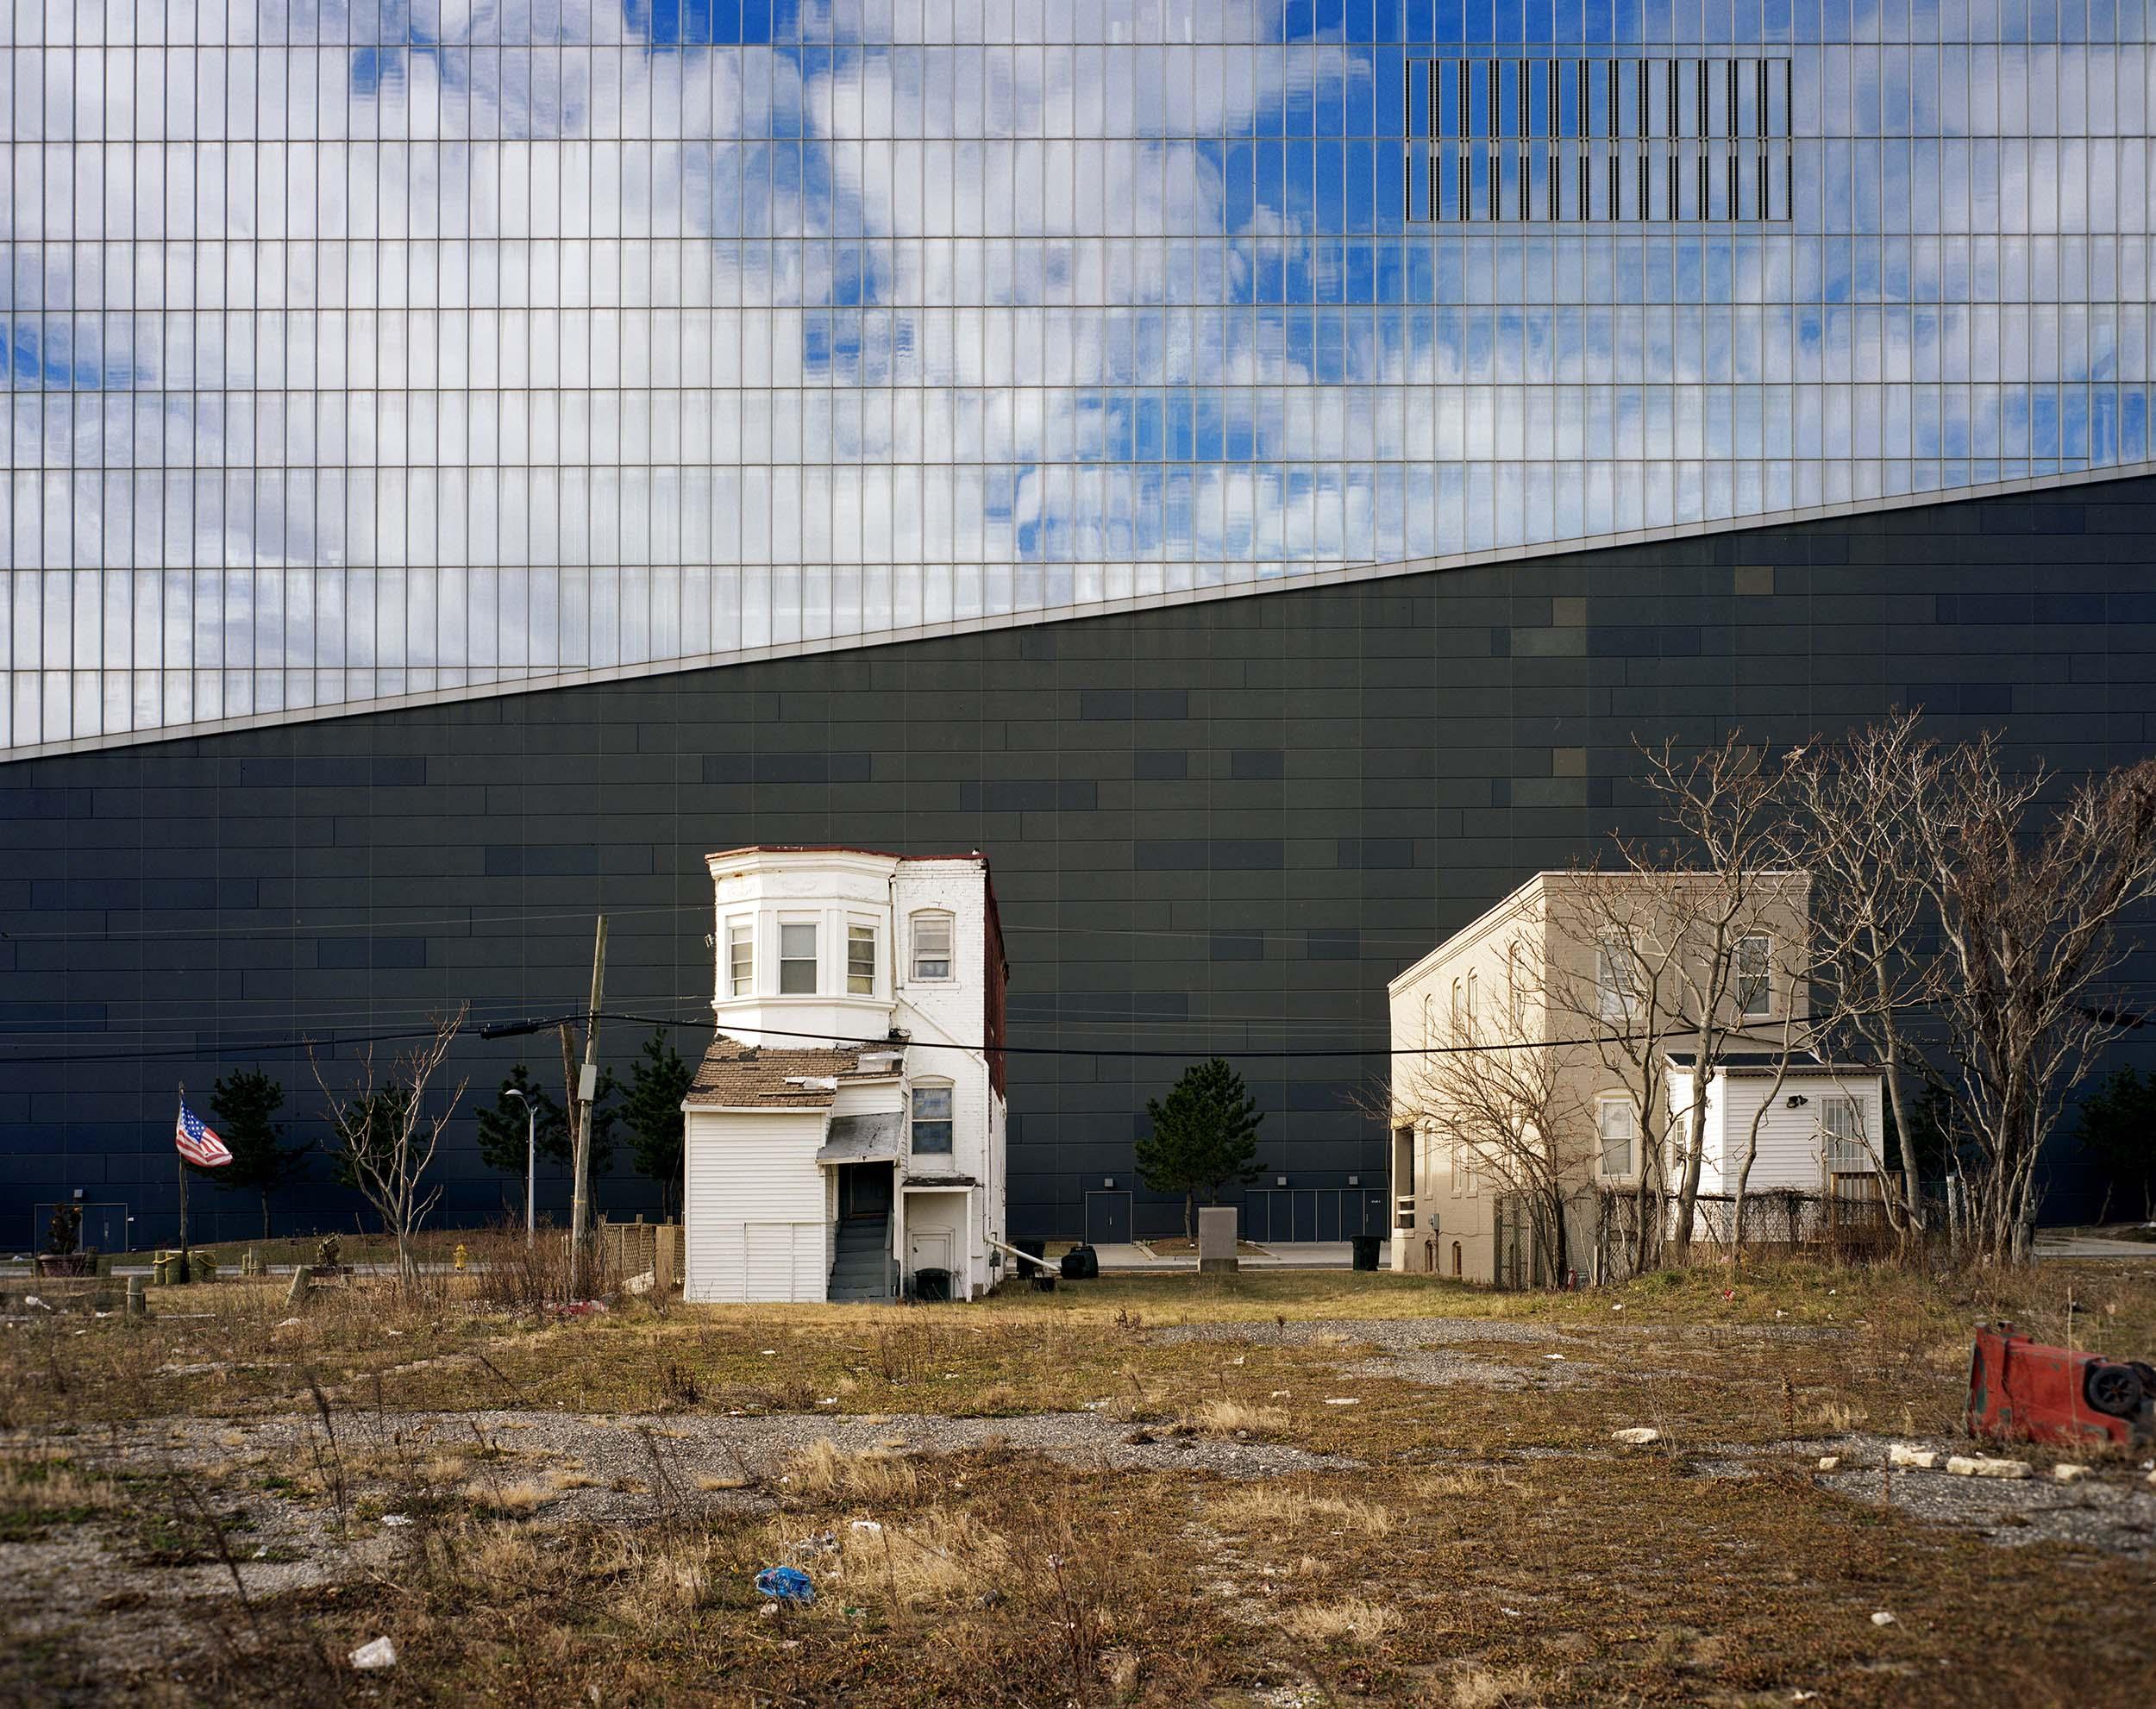 Atlantic City: Revel Casino - 2017, © Brian Rose